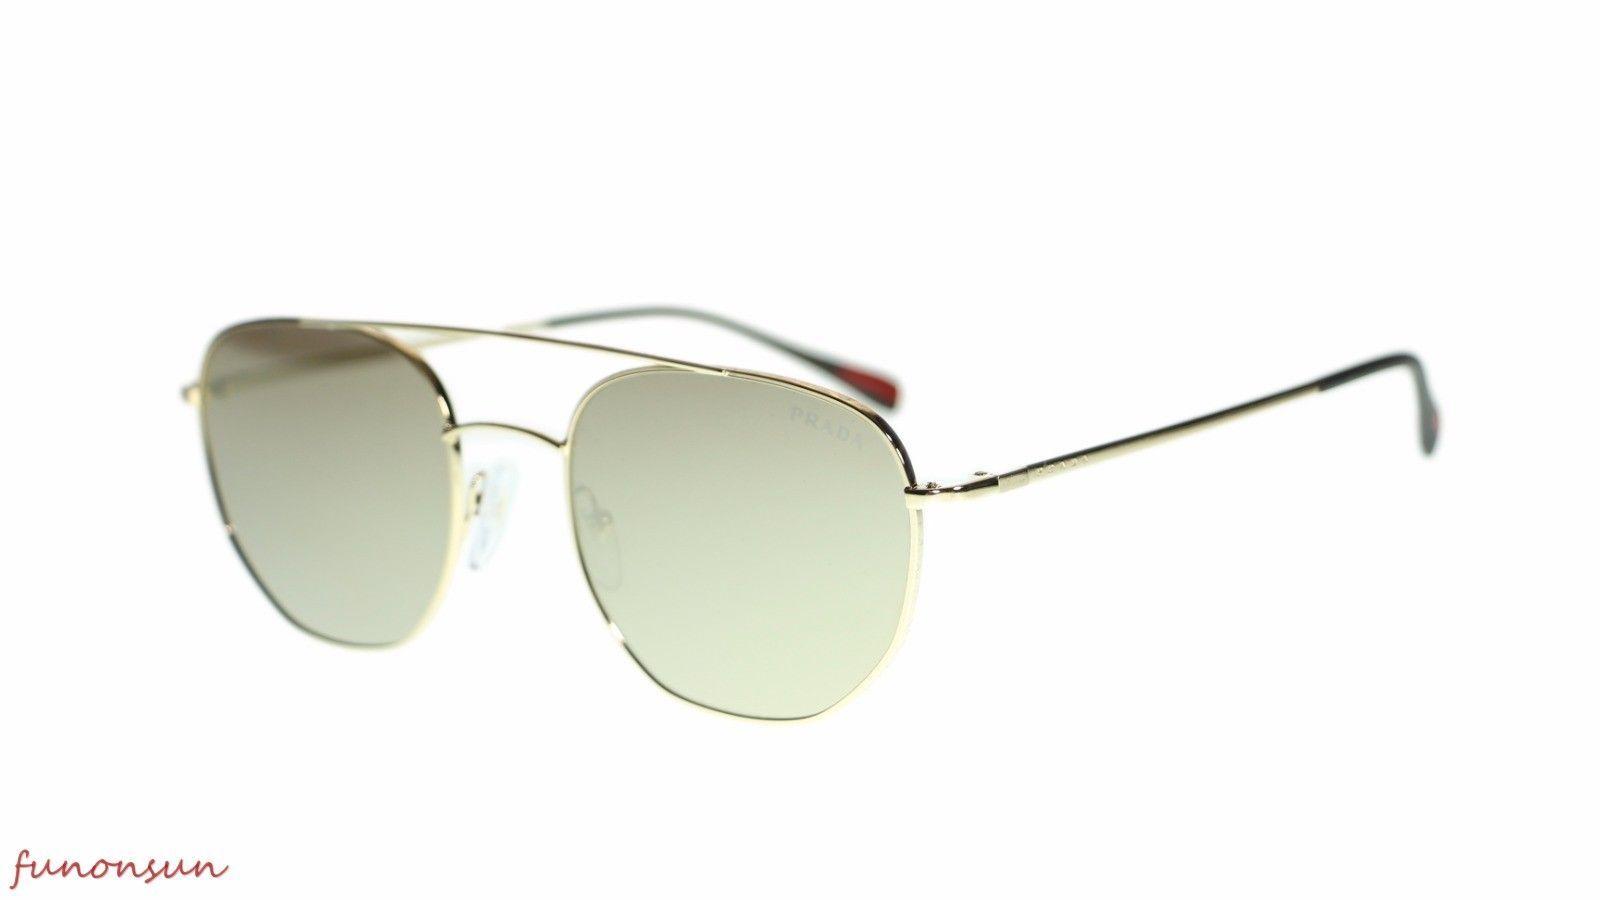 Prada Men's Sunglasses PS56SS ZVN1C0 Gold Brown Gold Mirror Lens 53mm - $193.03